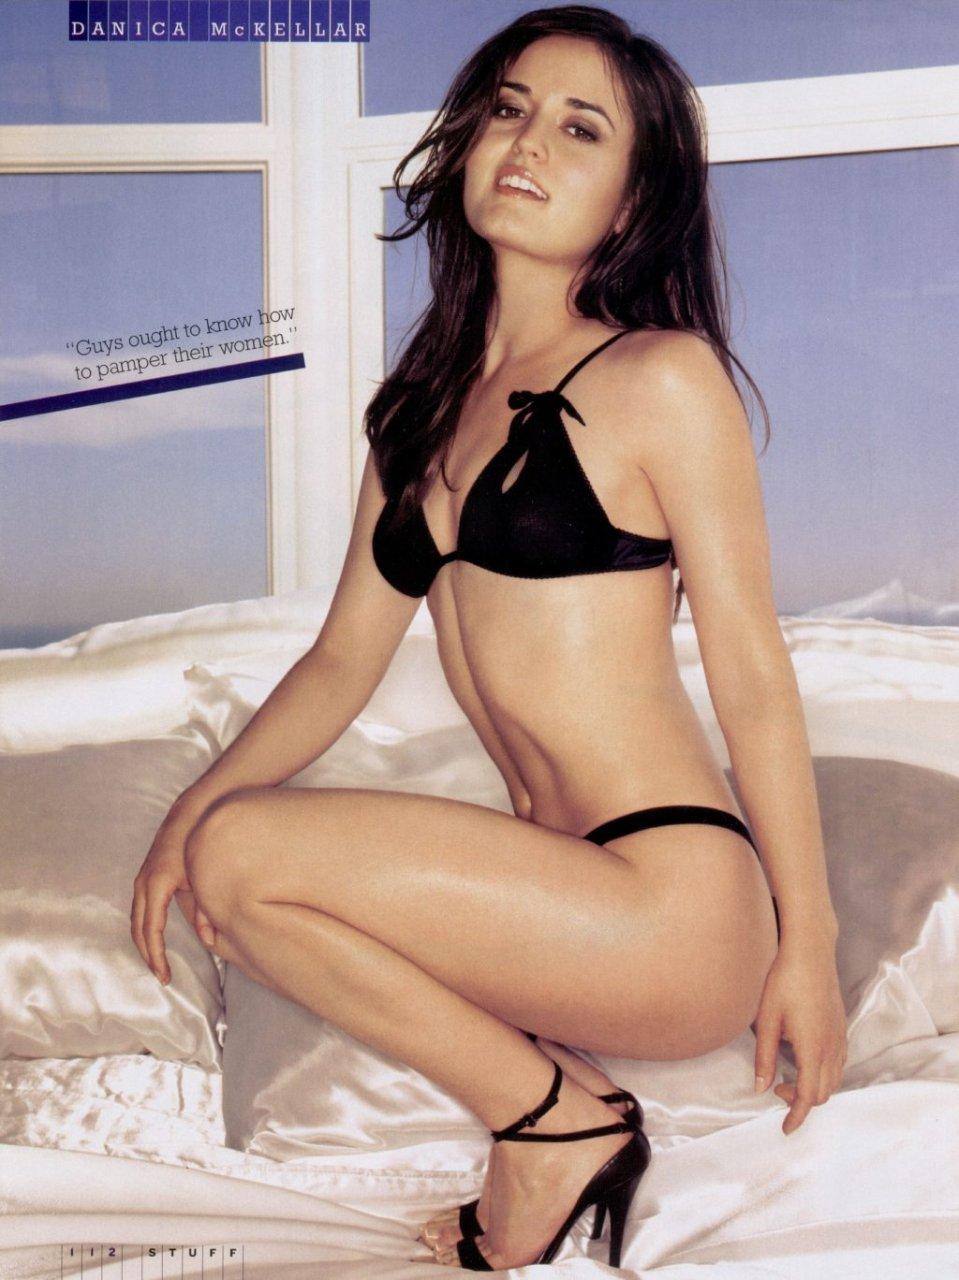 Nackt Danica McKellar  50 Sexy